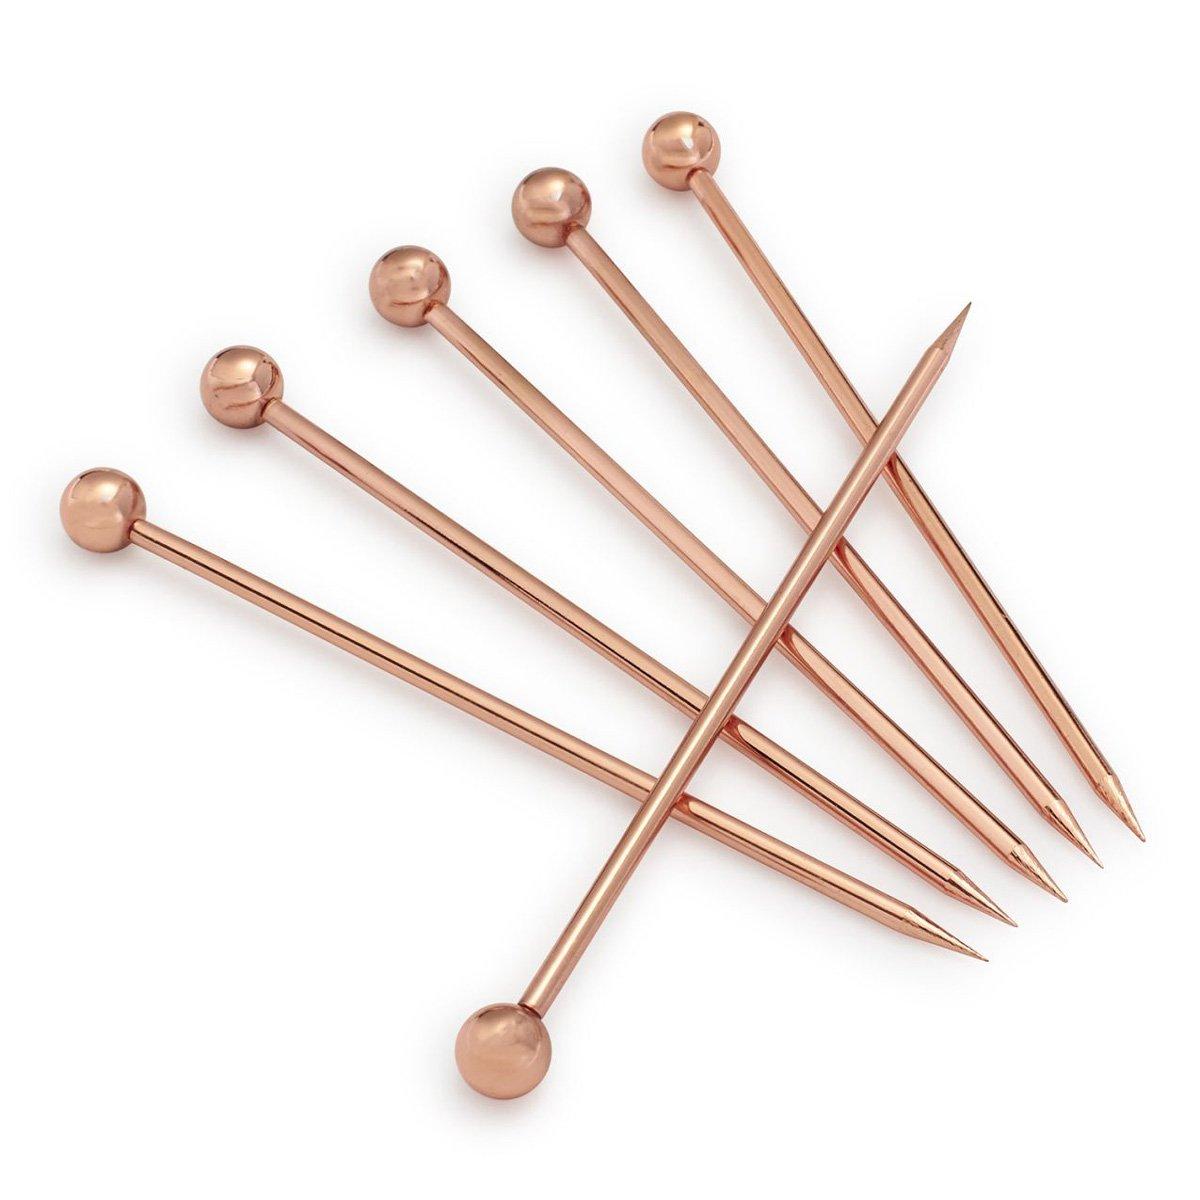 Ring Toothpicks